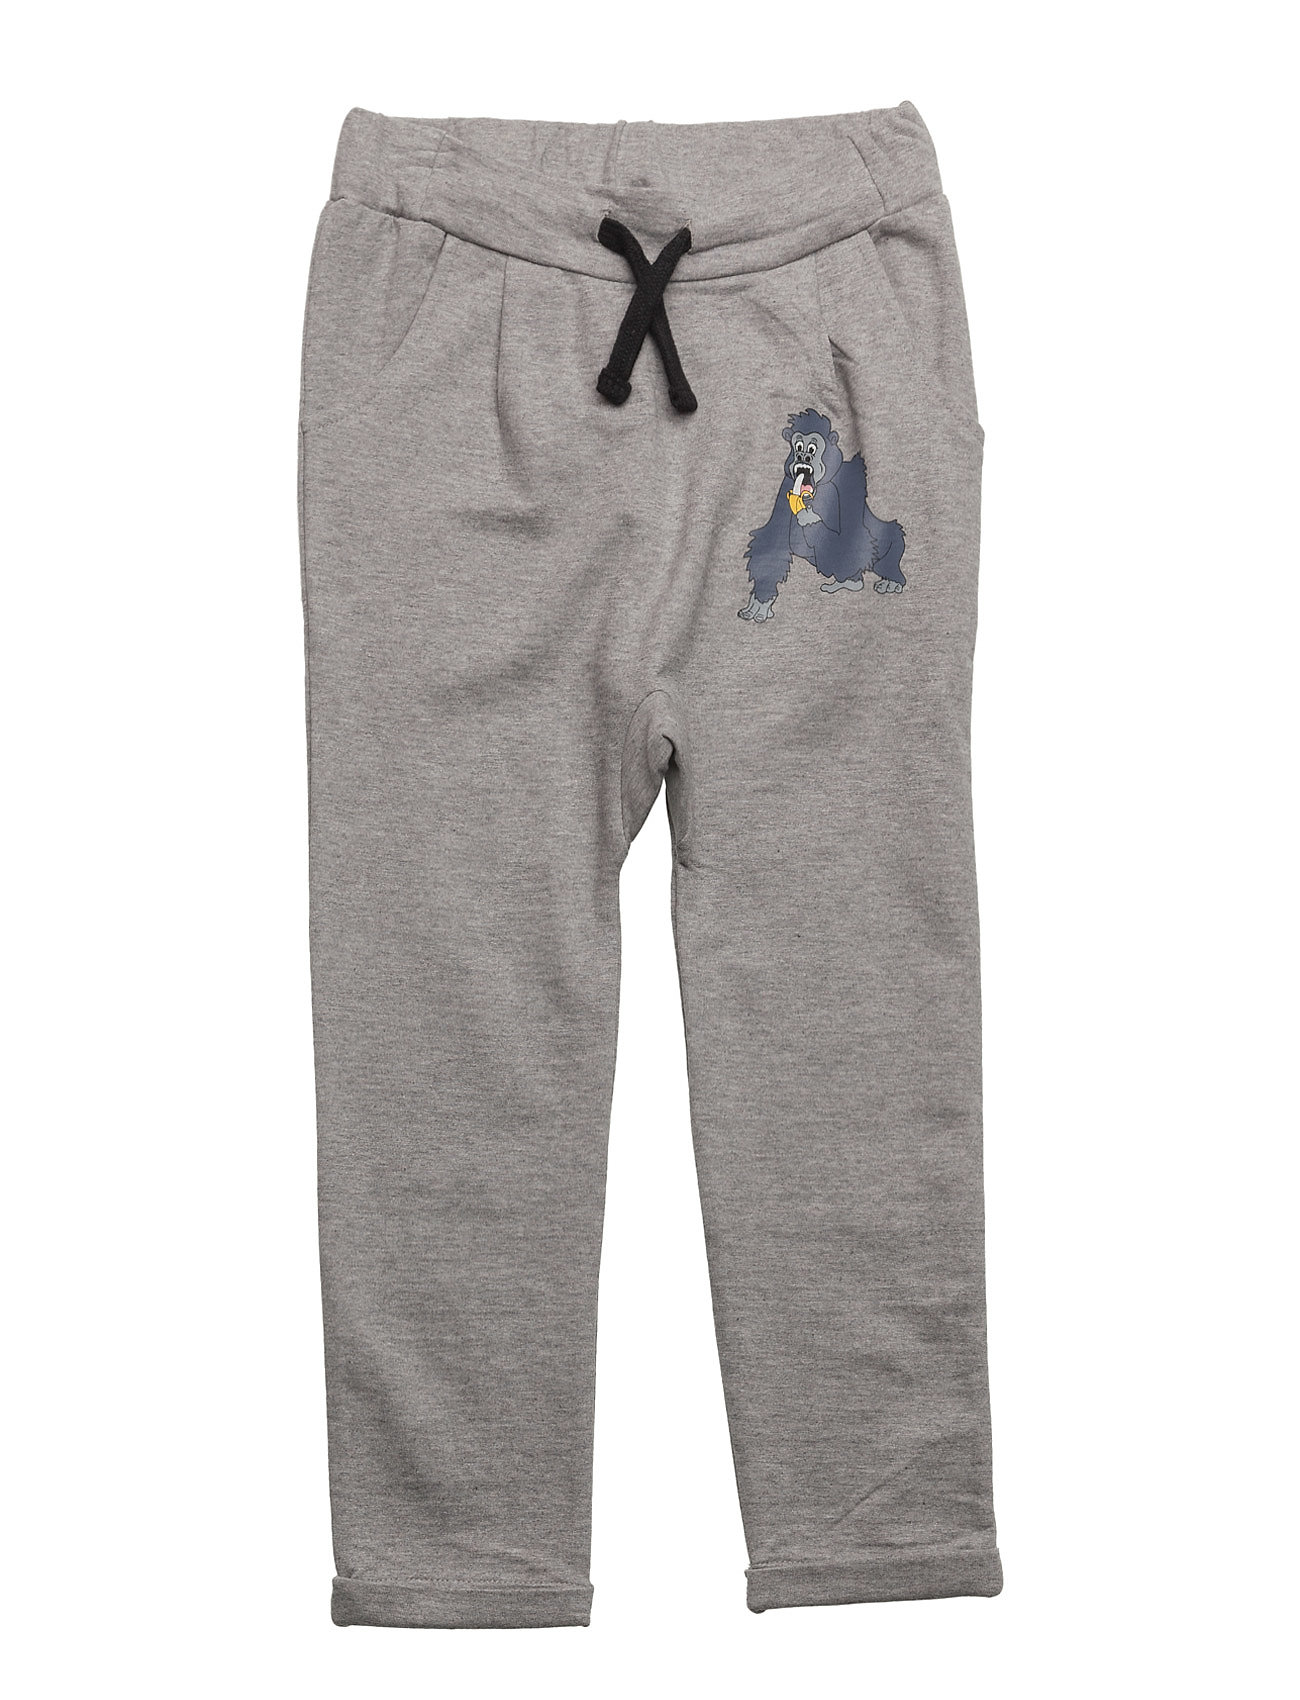 tao & friends – Sweatpants gorillan single-animal grey på boozt.com dk